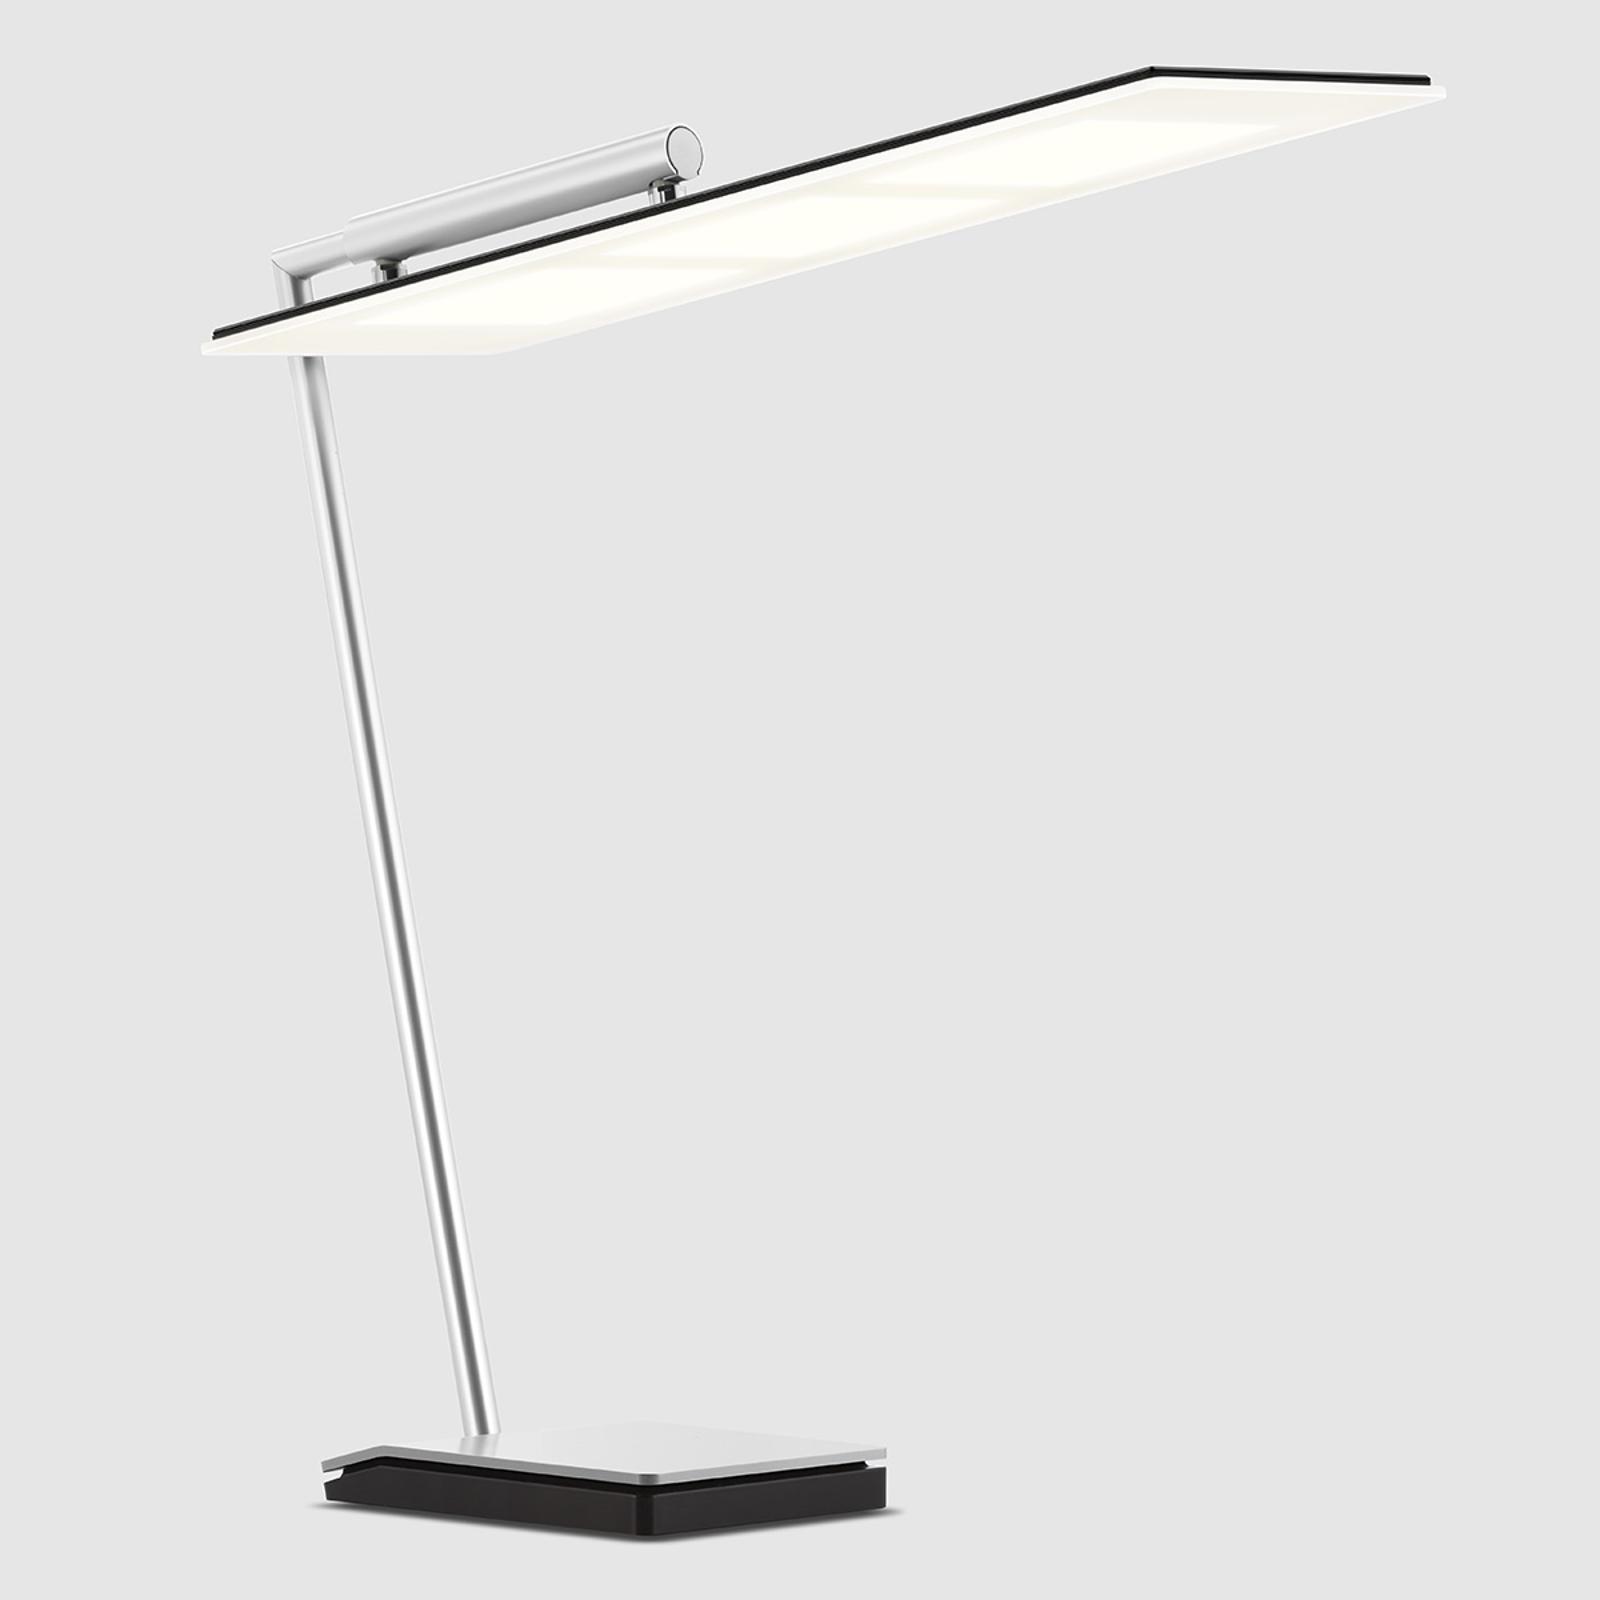 Zwarte OLED bureaulamp OMLED One d3